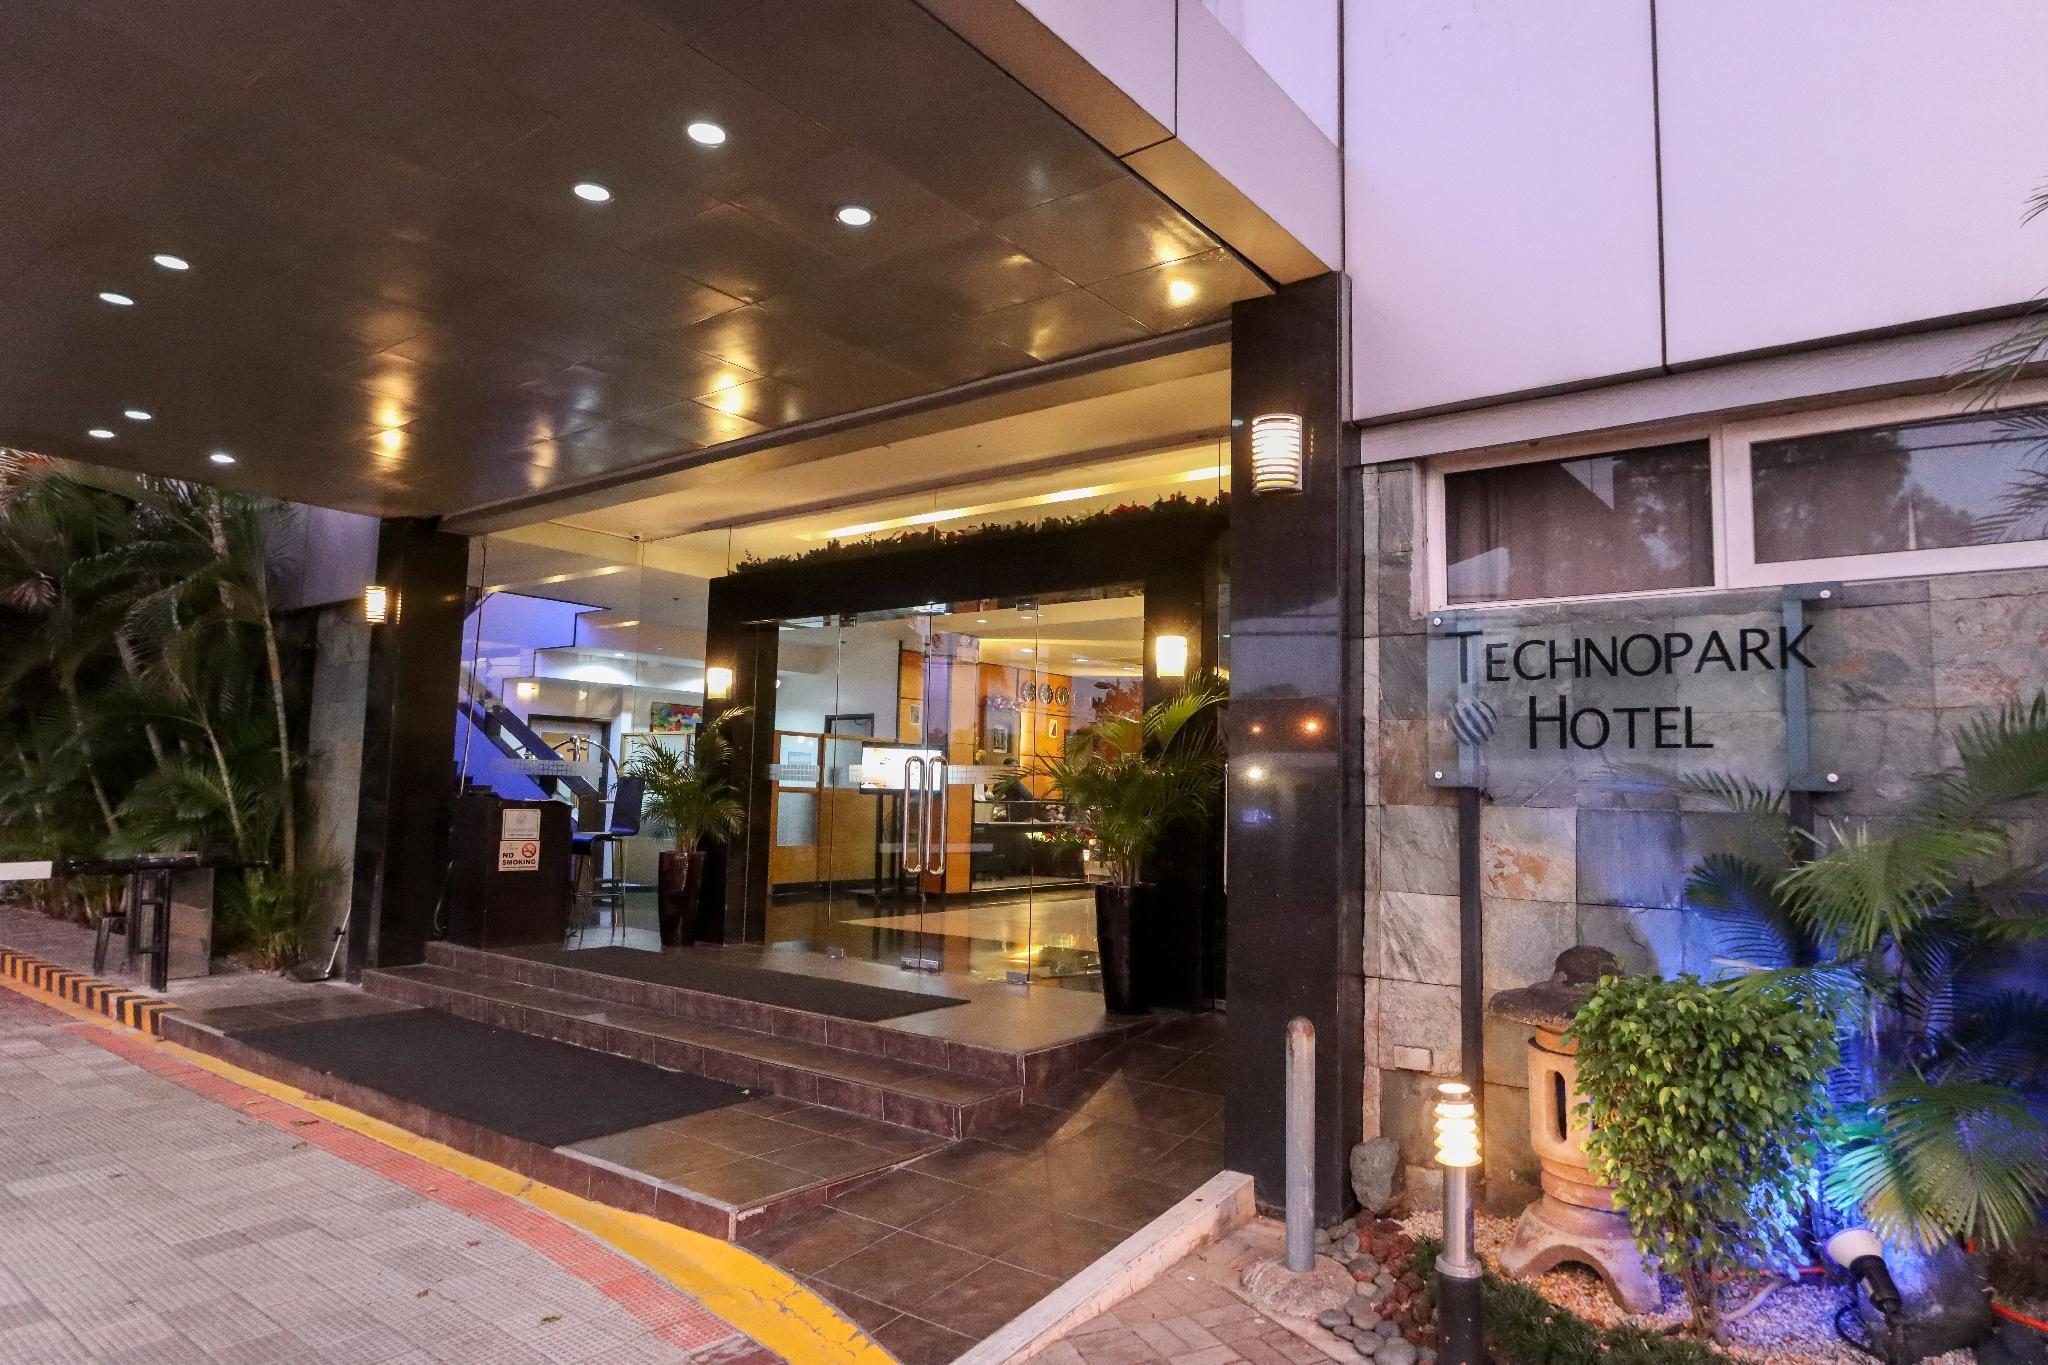 Technopark Hotel